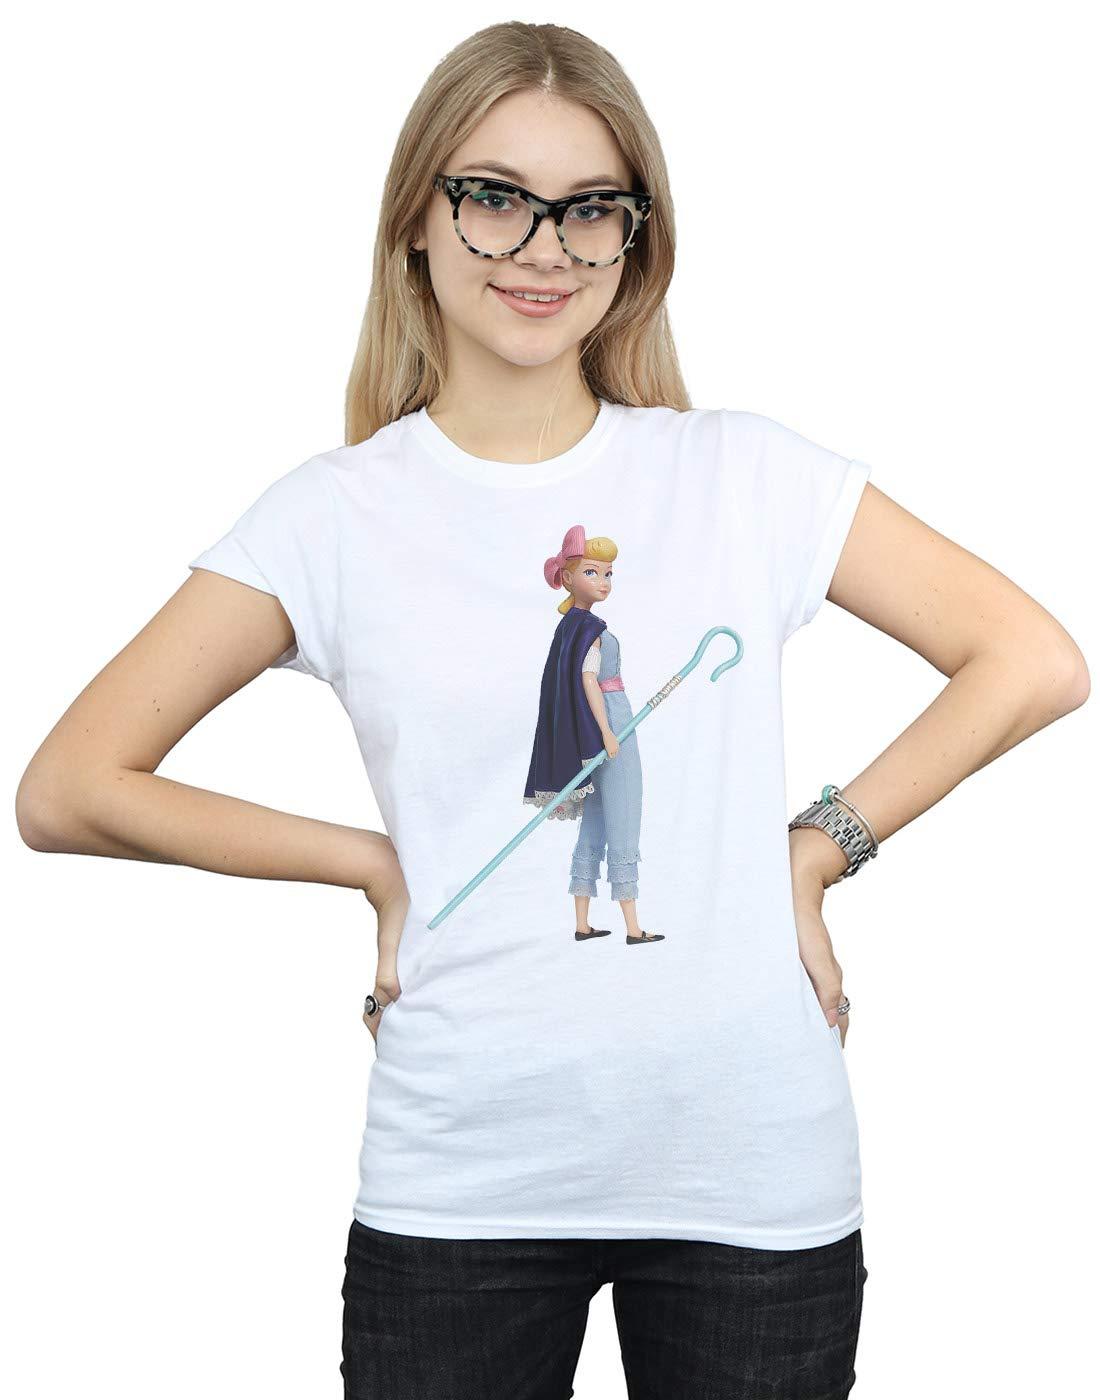 Disney Toy Story 4 Little Bo Peep Tshirt